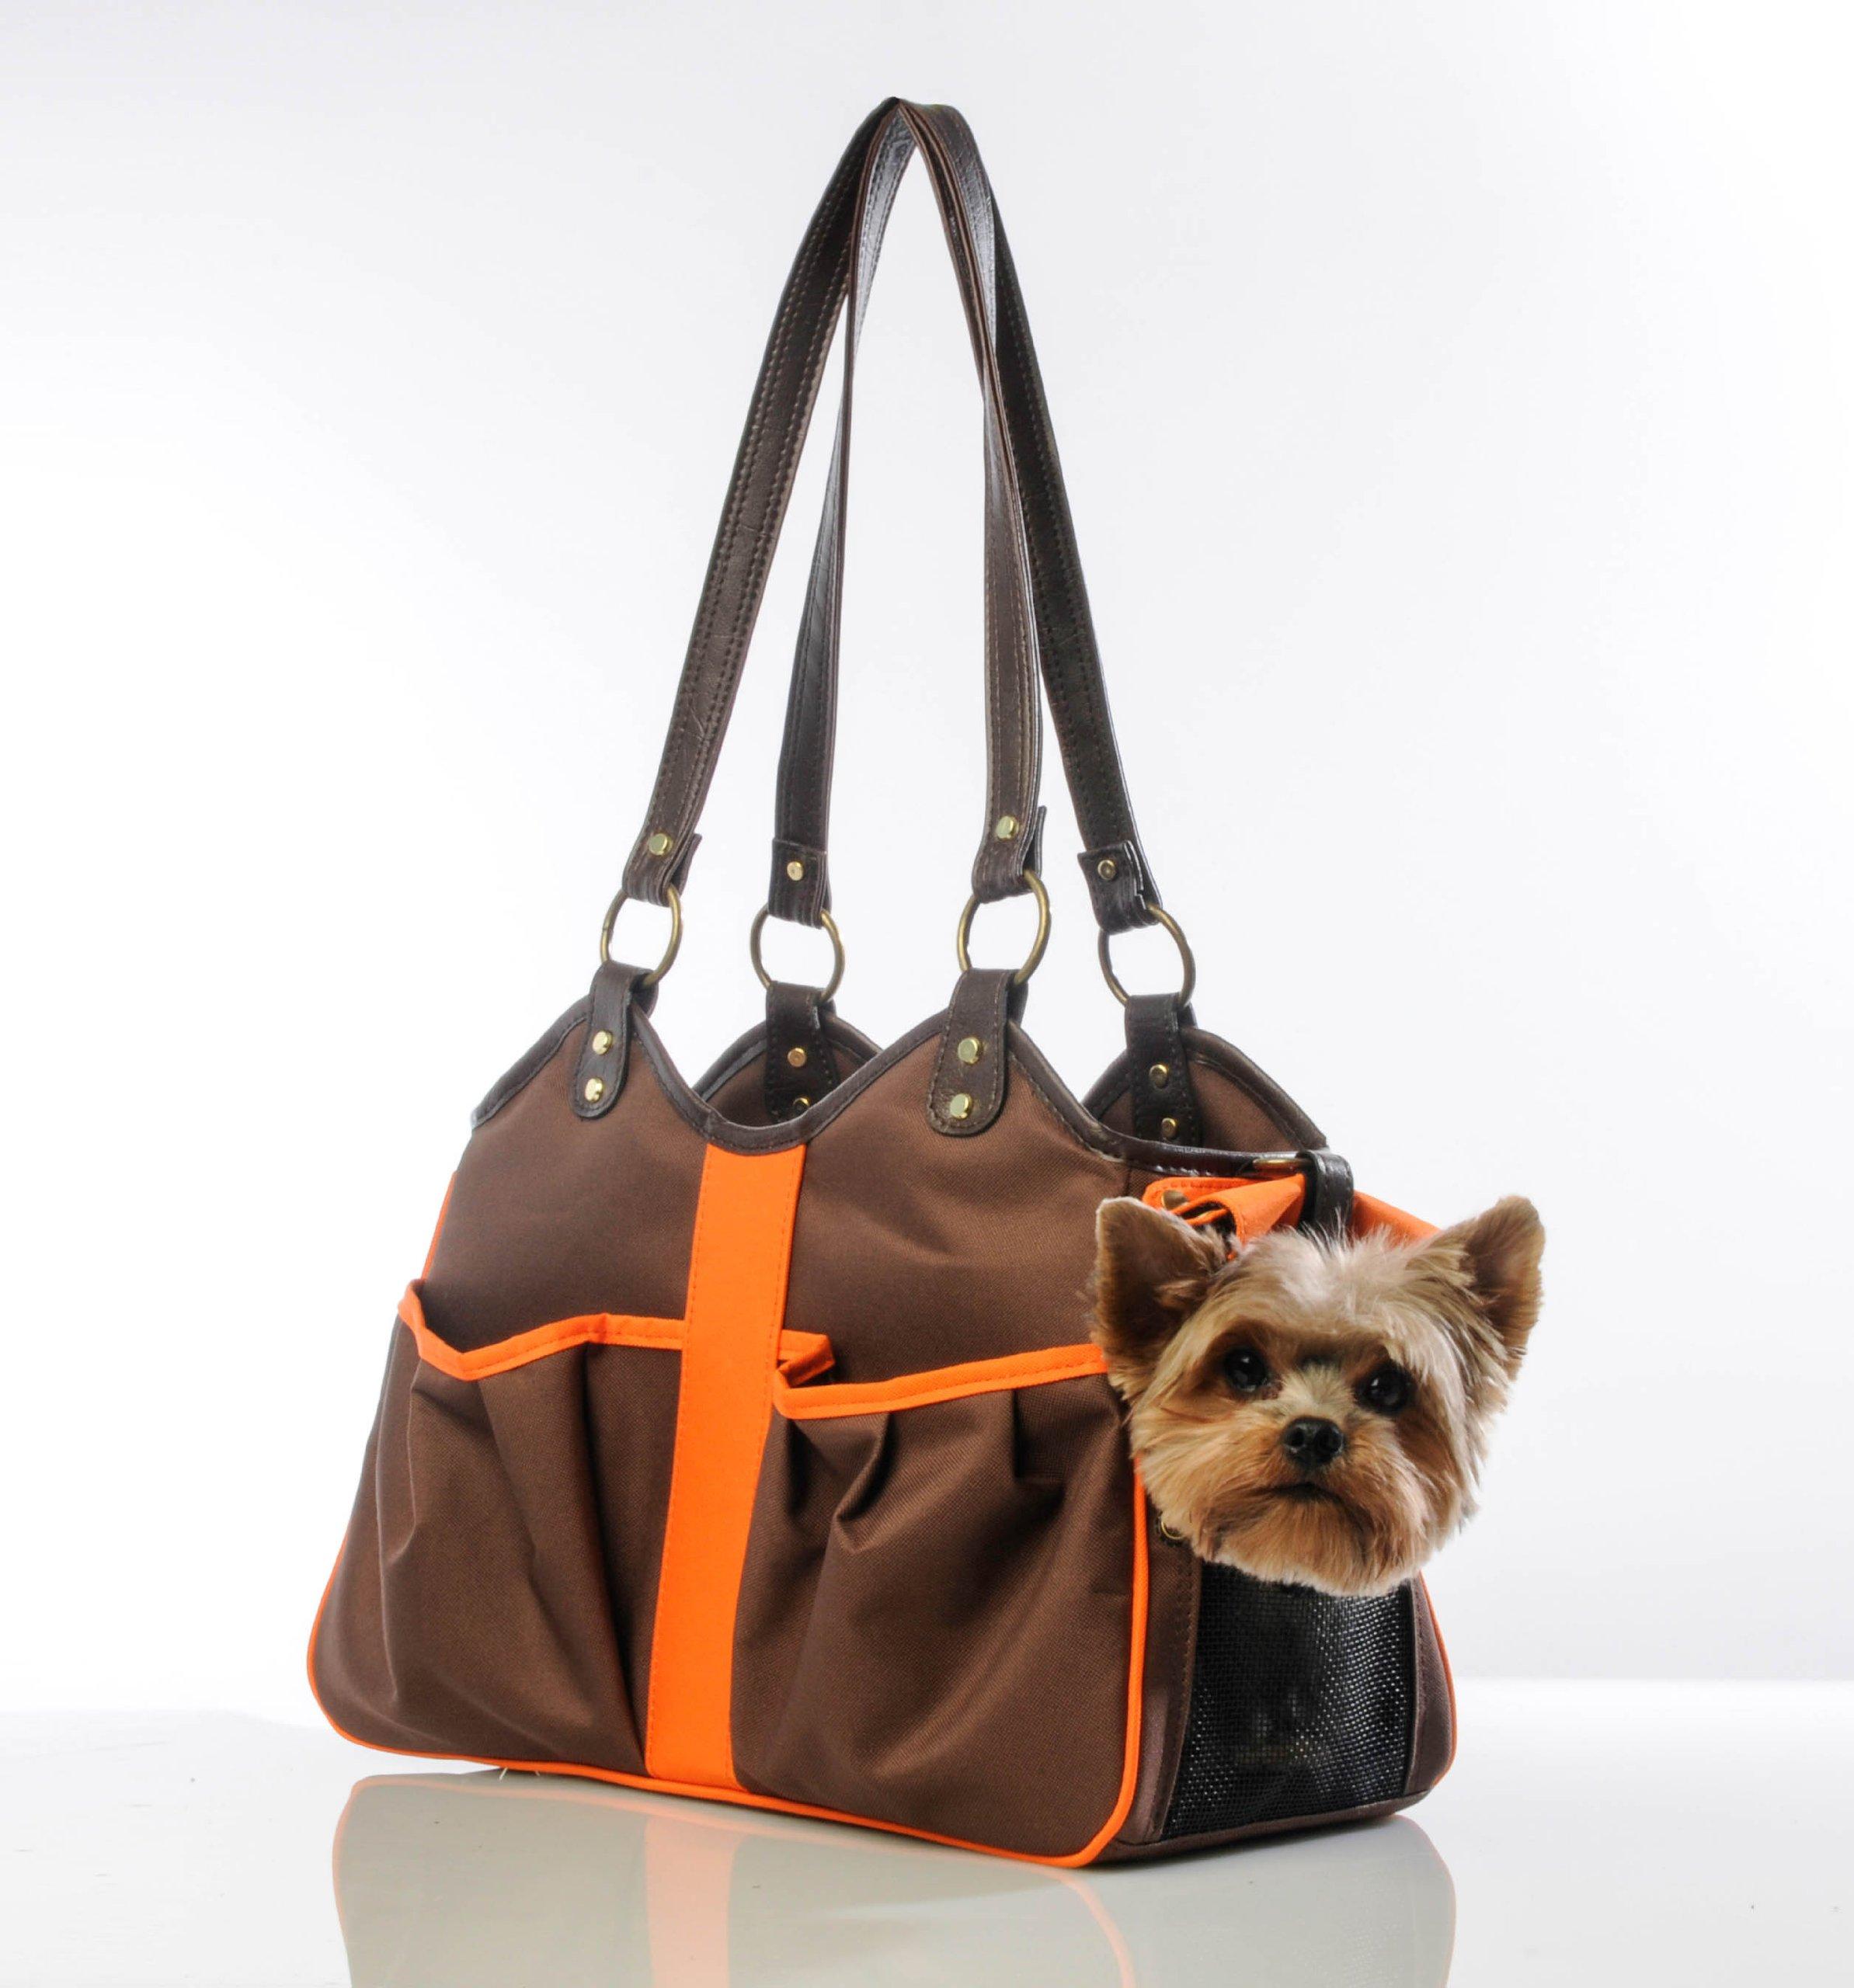 Petote Metro 2 Pet Carrier Bag, Large, Brown/Orange